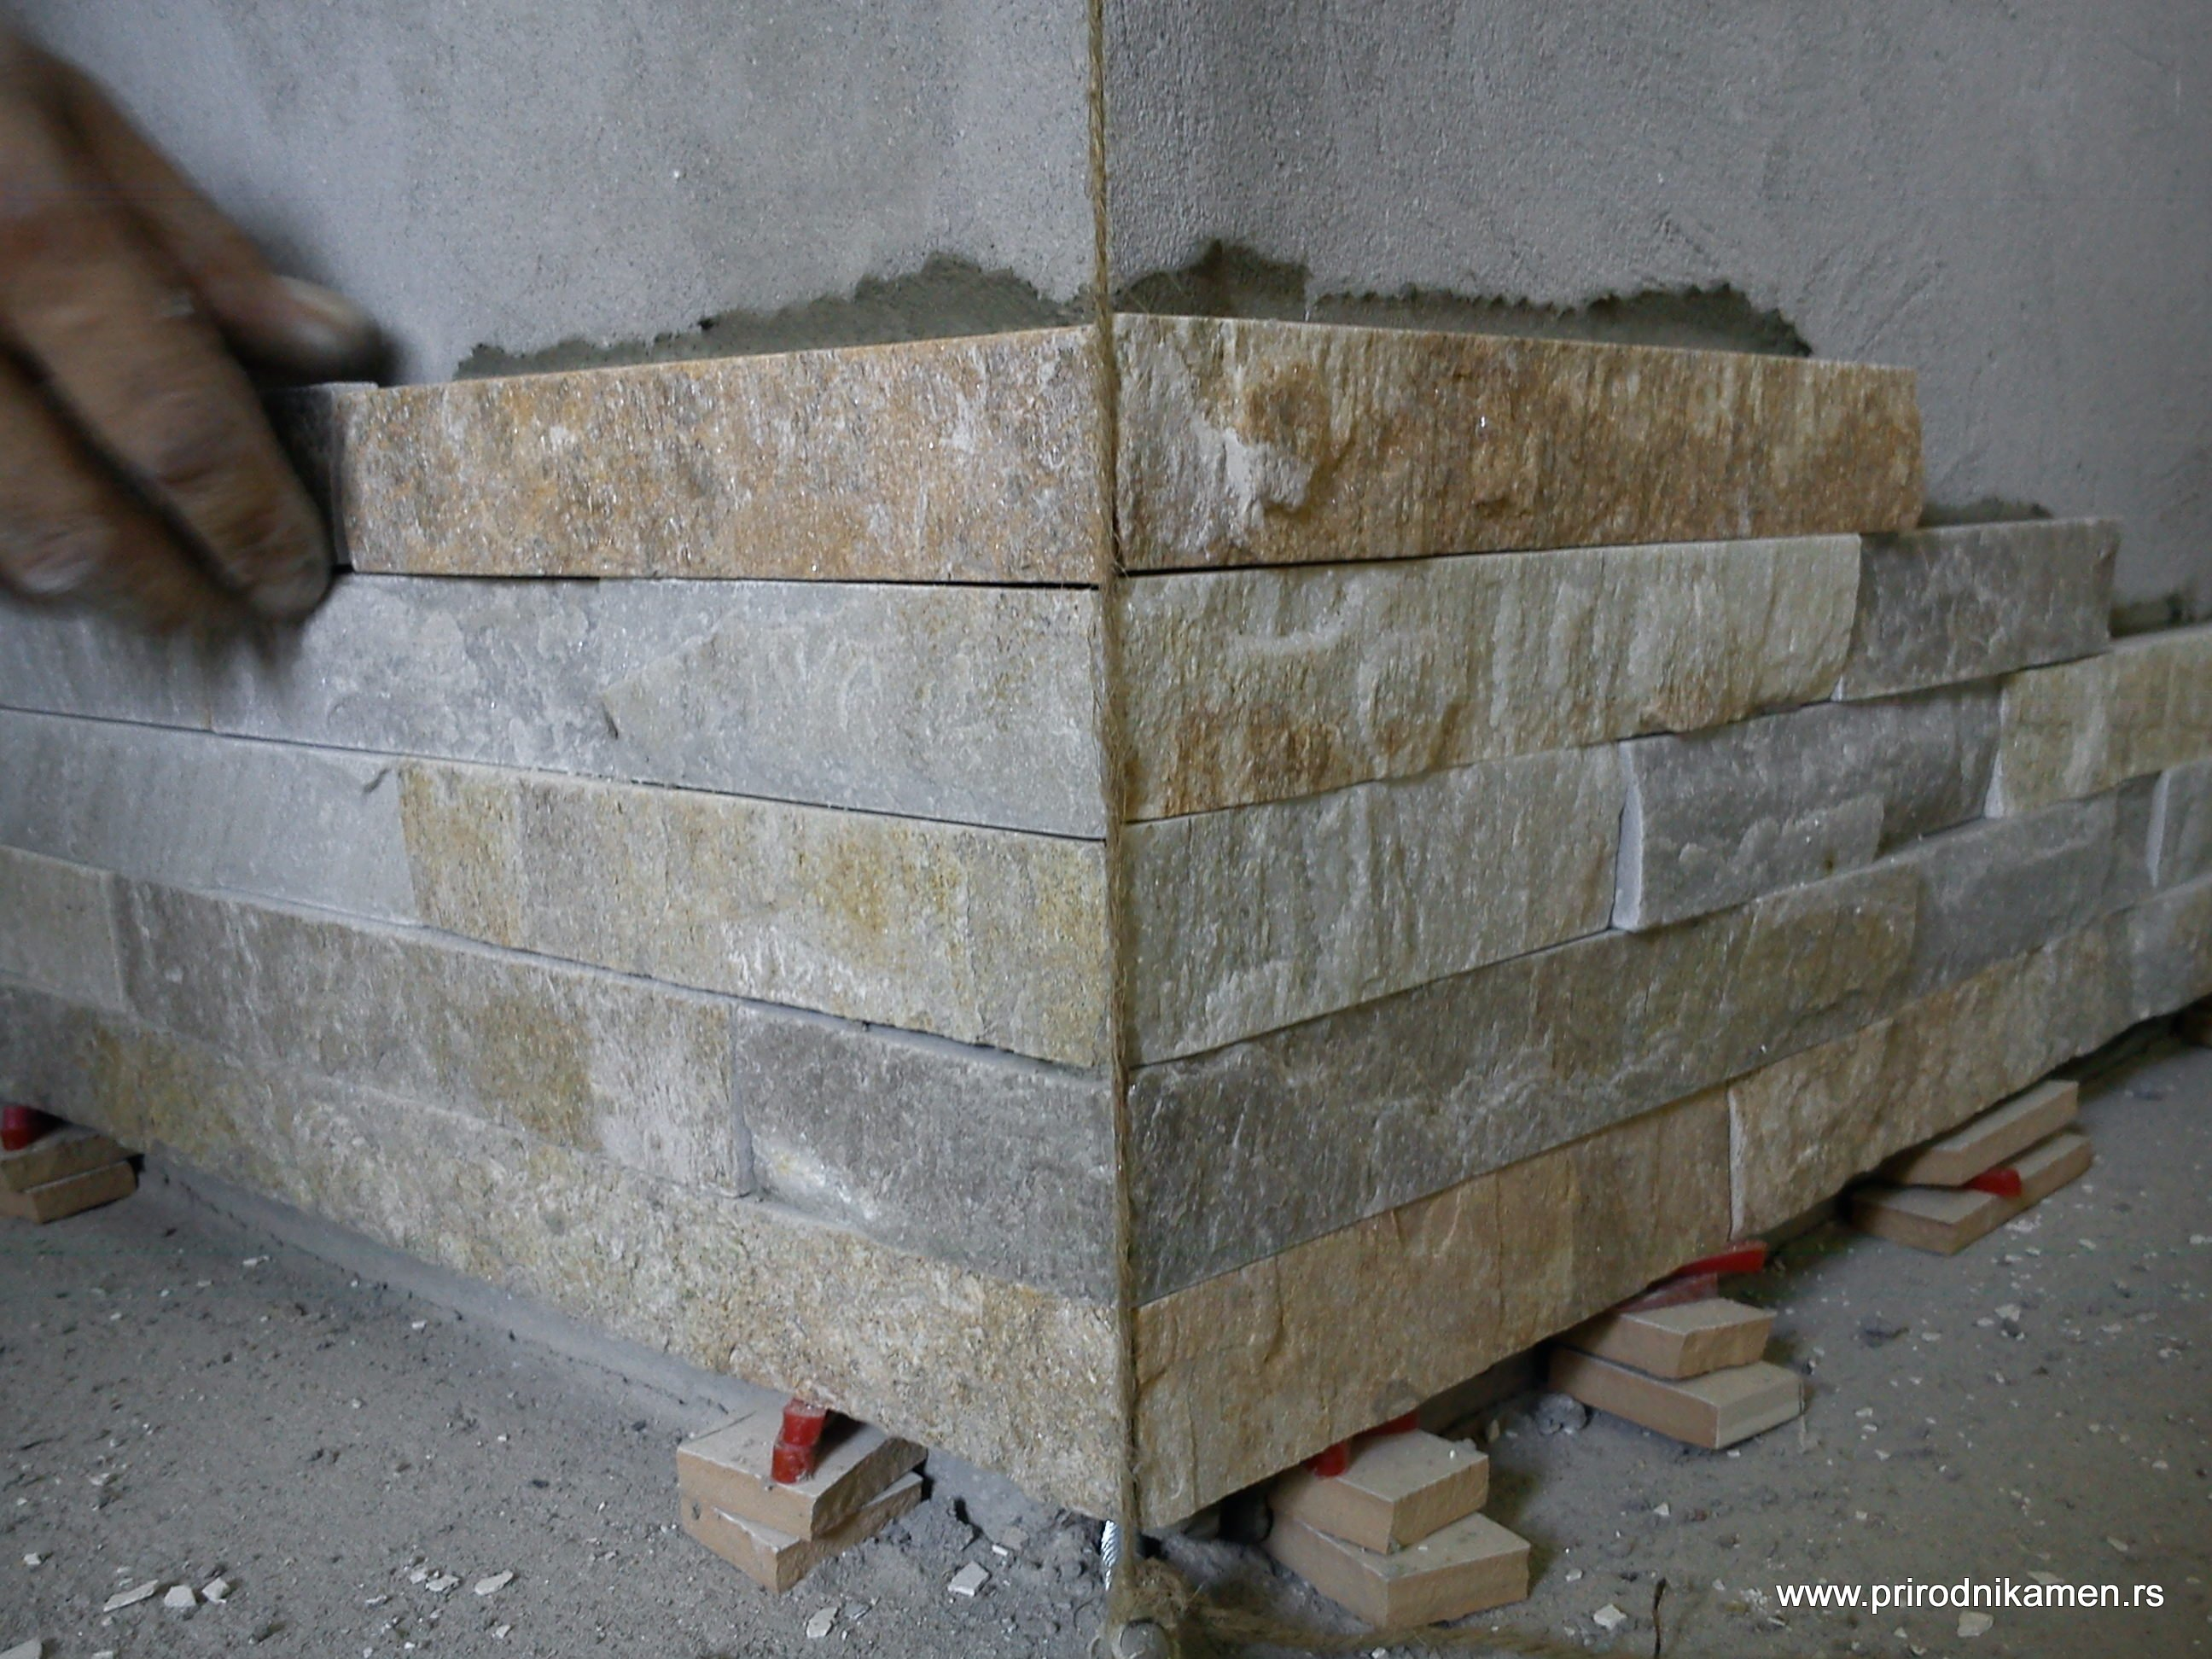 Ugradnja prirodni kamen-gerovane ivice (9)